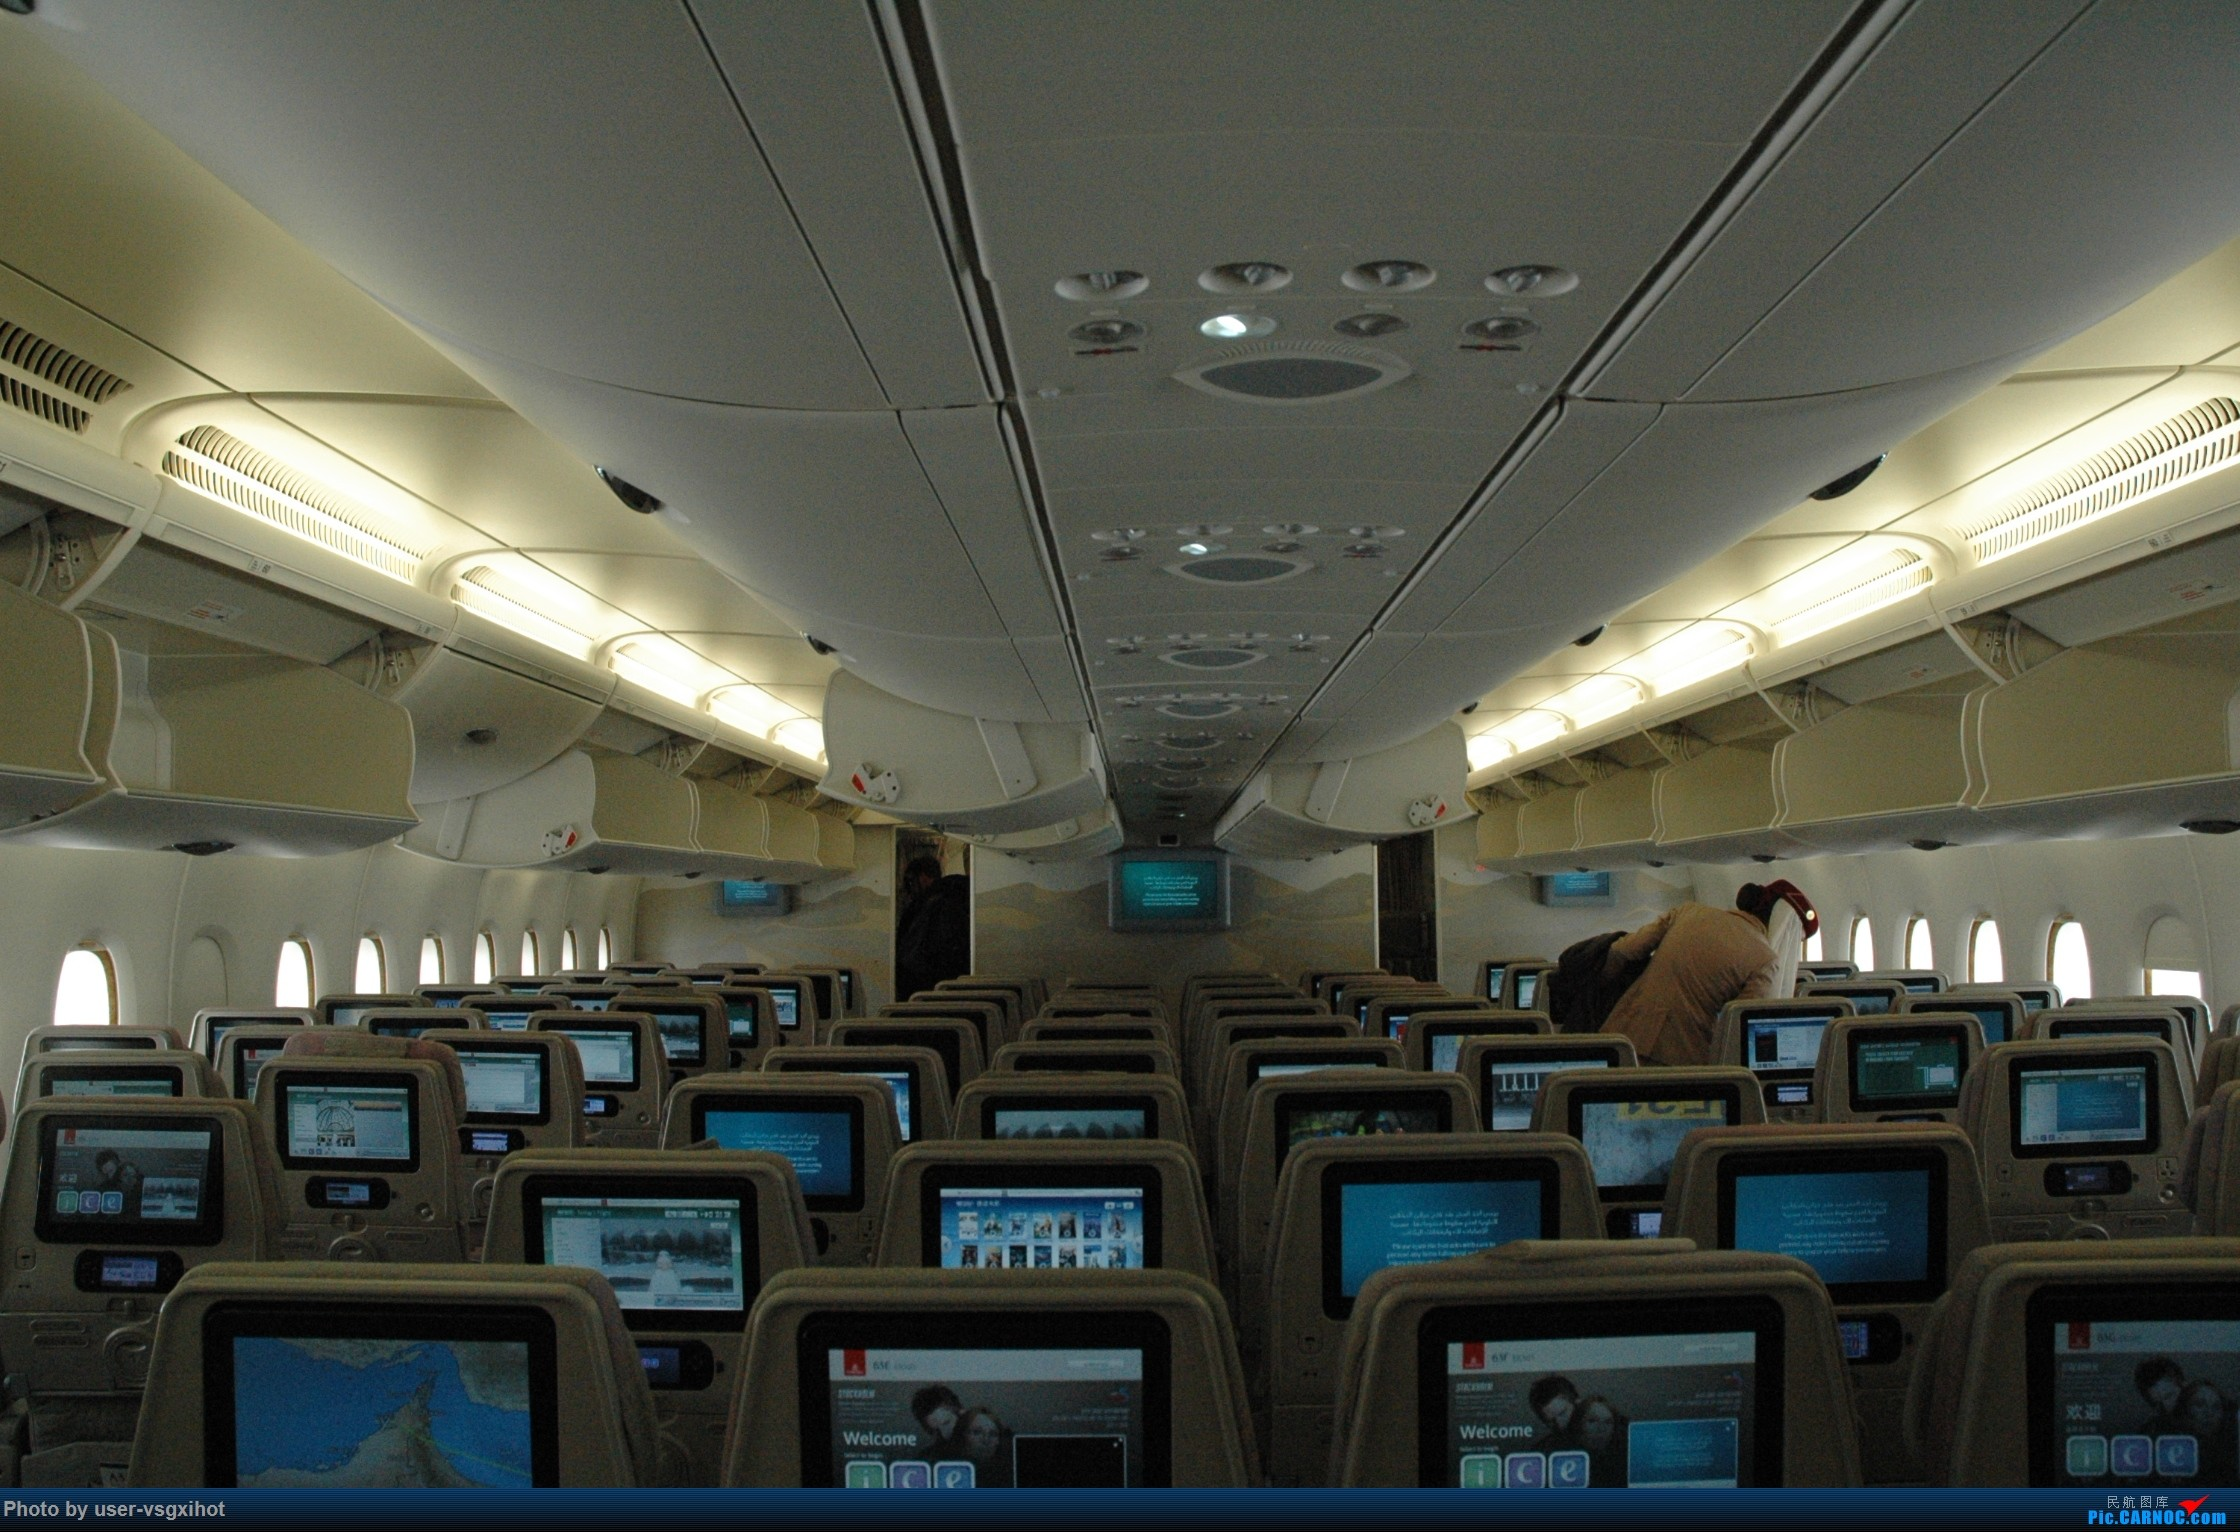 Re:[原创]【Hans游记(6)出埃及记】(PART 1)经阿航转机初识埃及,40度高温下の开罗一日游 AIRBUS A380-800  迪拜国际机场